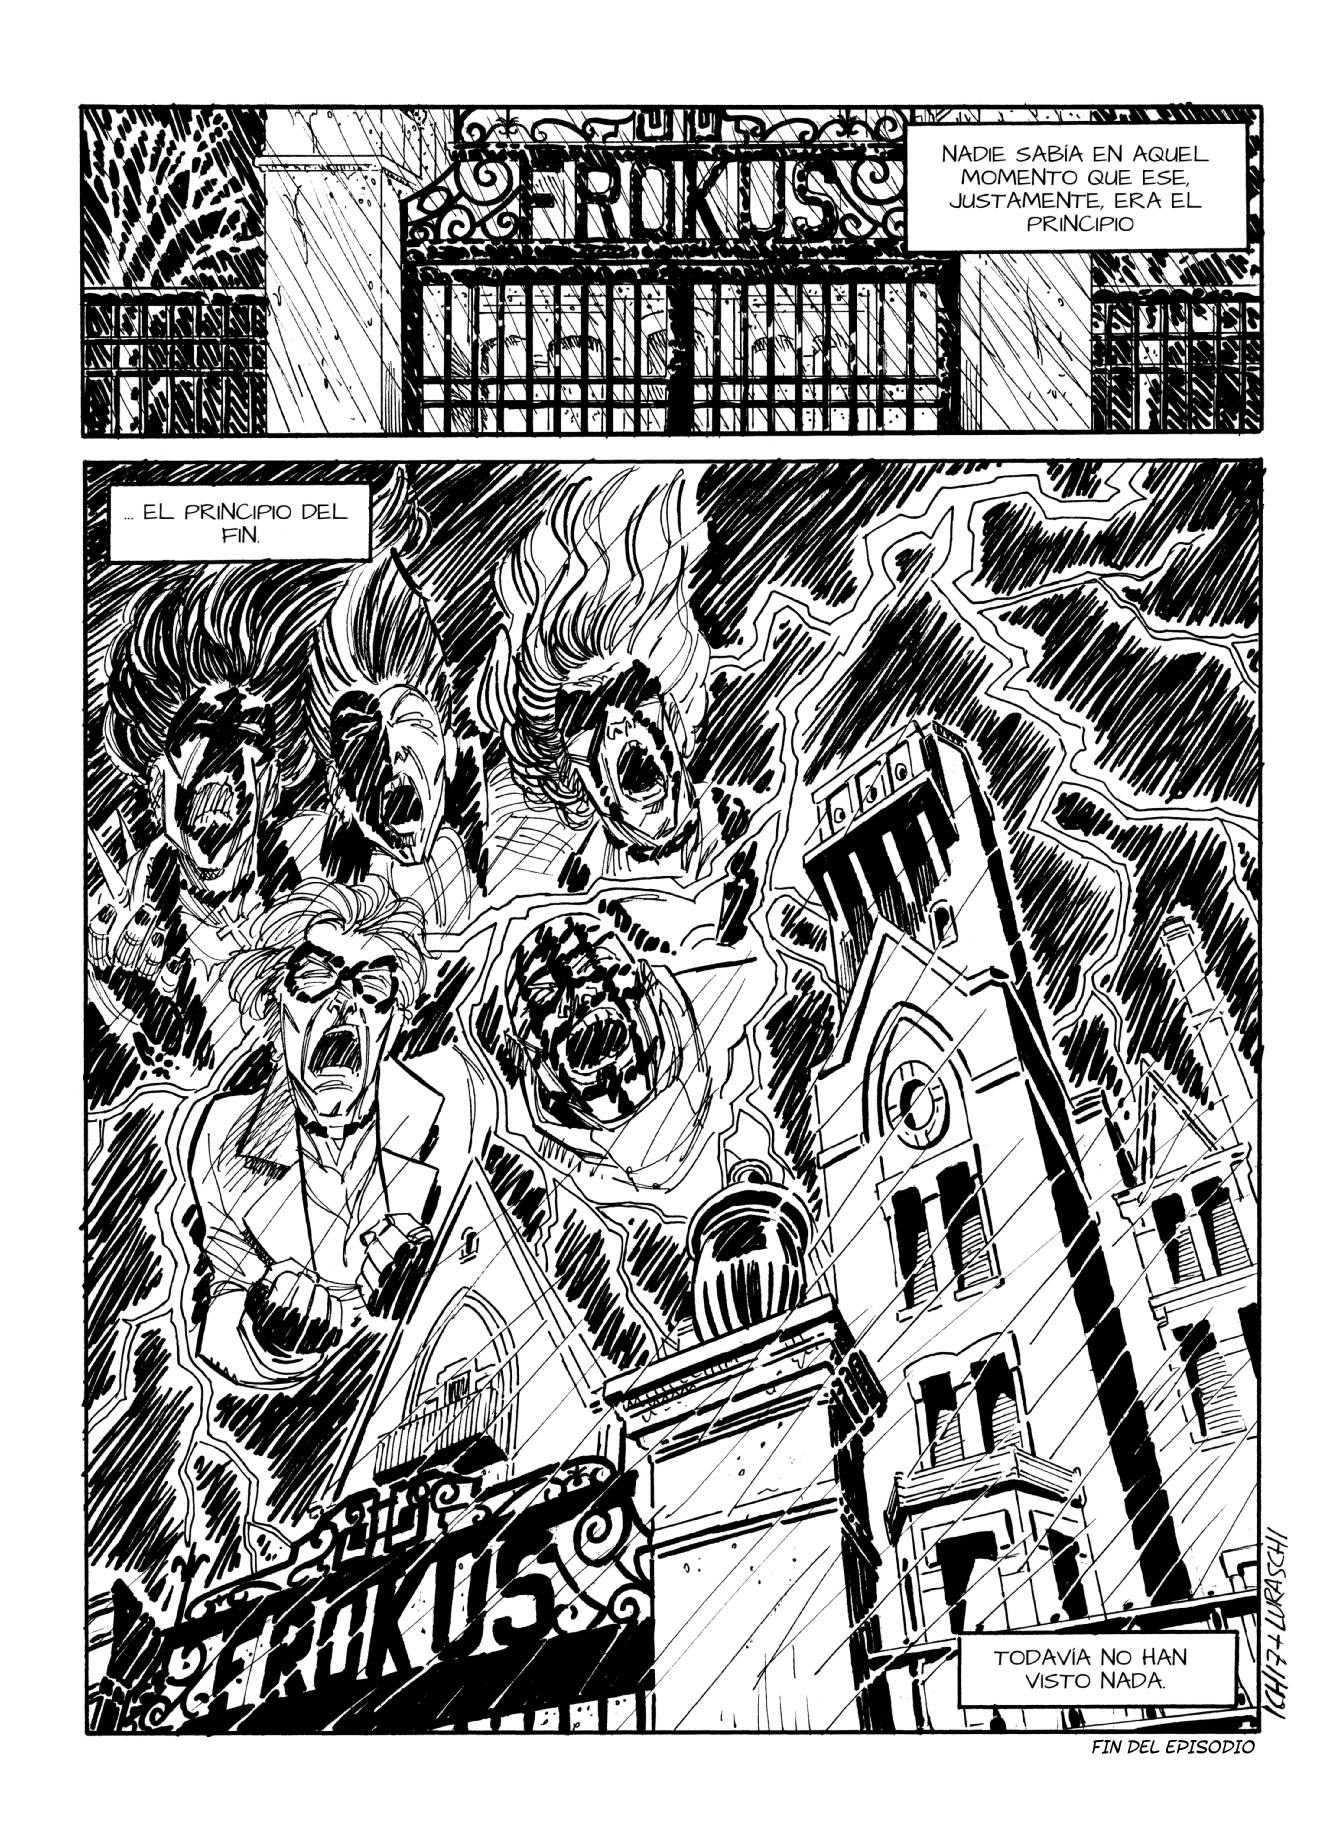 SpectrumWarriors-issue-01-page-12